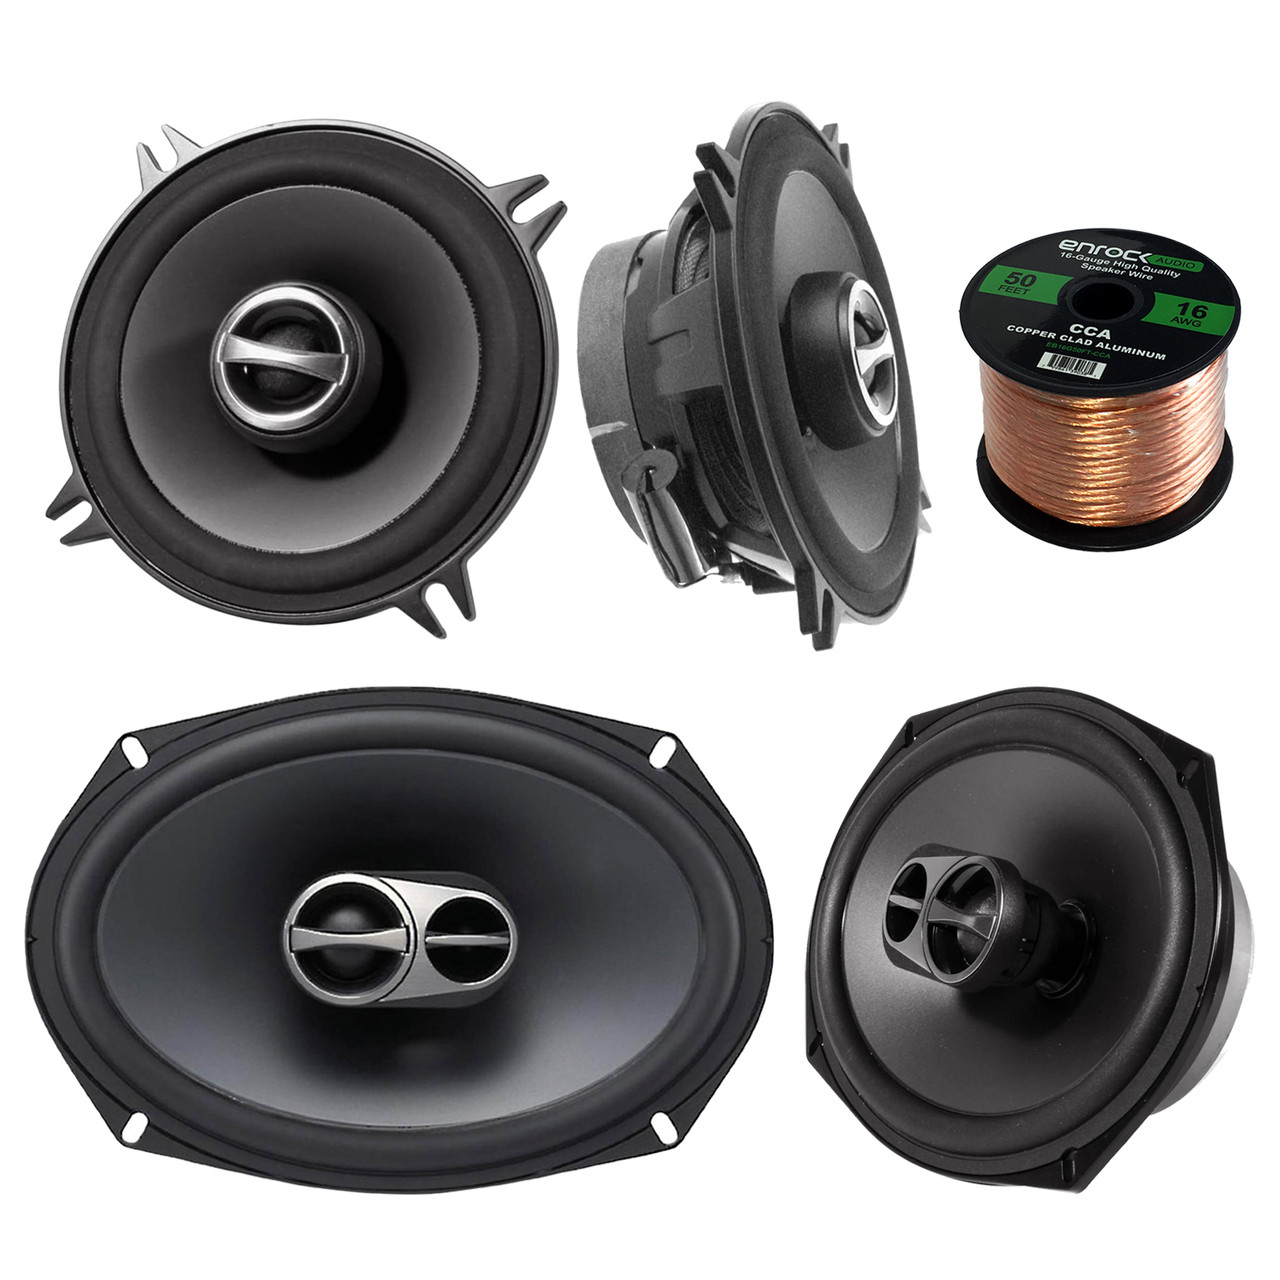 car speaker package of alpine sps 510 5 25 2 way car audio speakers 4 Conductor Wiring car speaker package of alpine sps 510 5 25 2 way car audio speakers